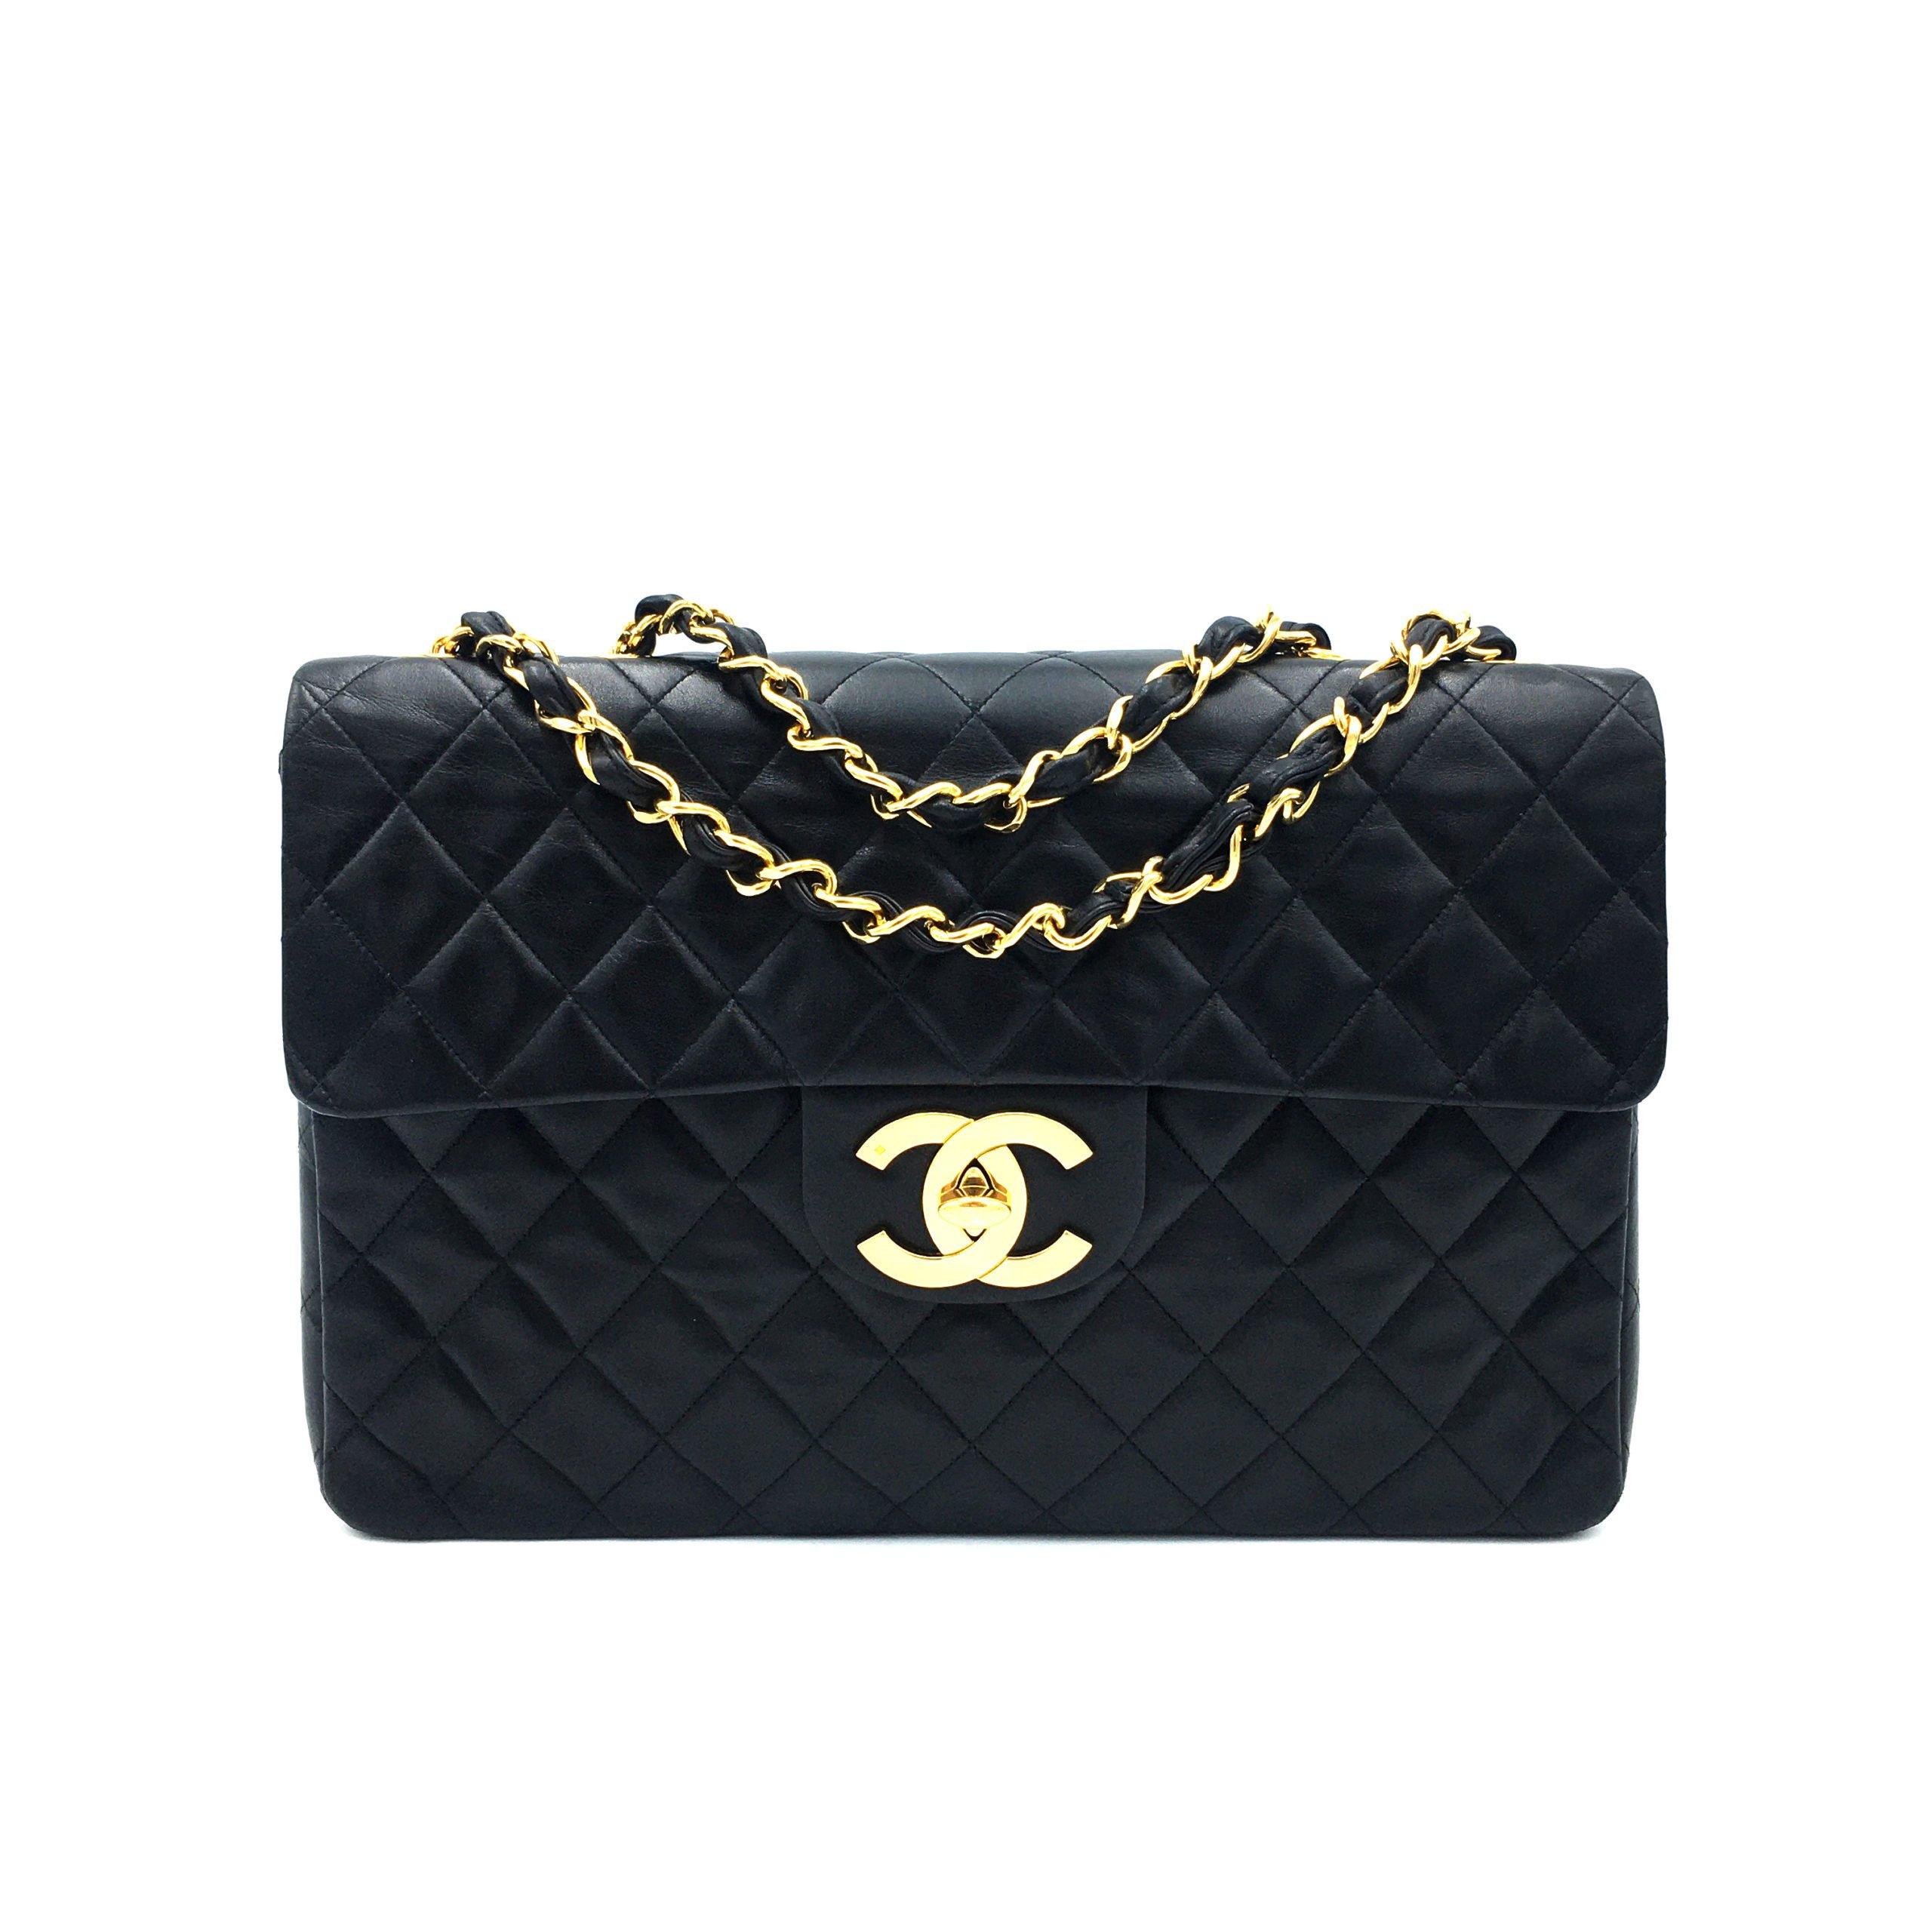 Borse Chanel Vintage Usate.Timeless Maxi Jumbo Big Logo Otto Vintage Borsa Chanel Maxi Jumbo